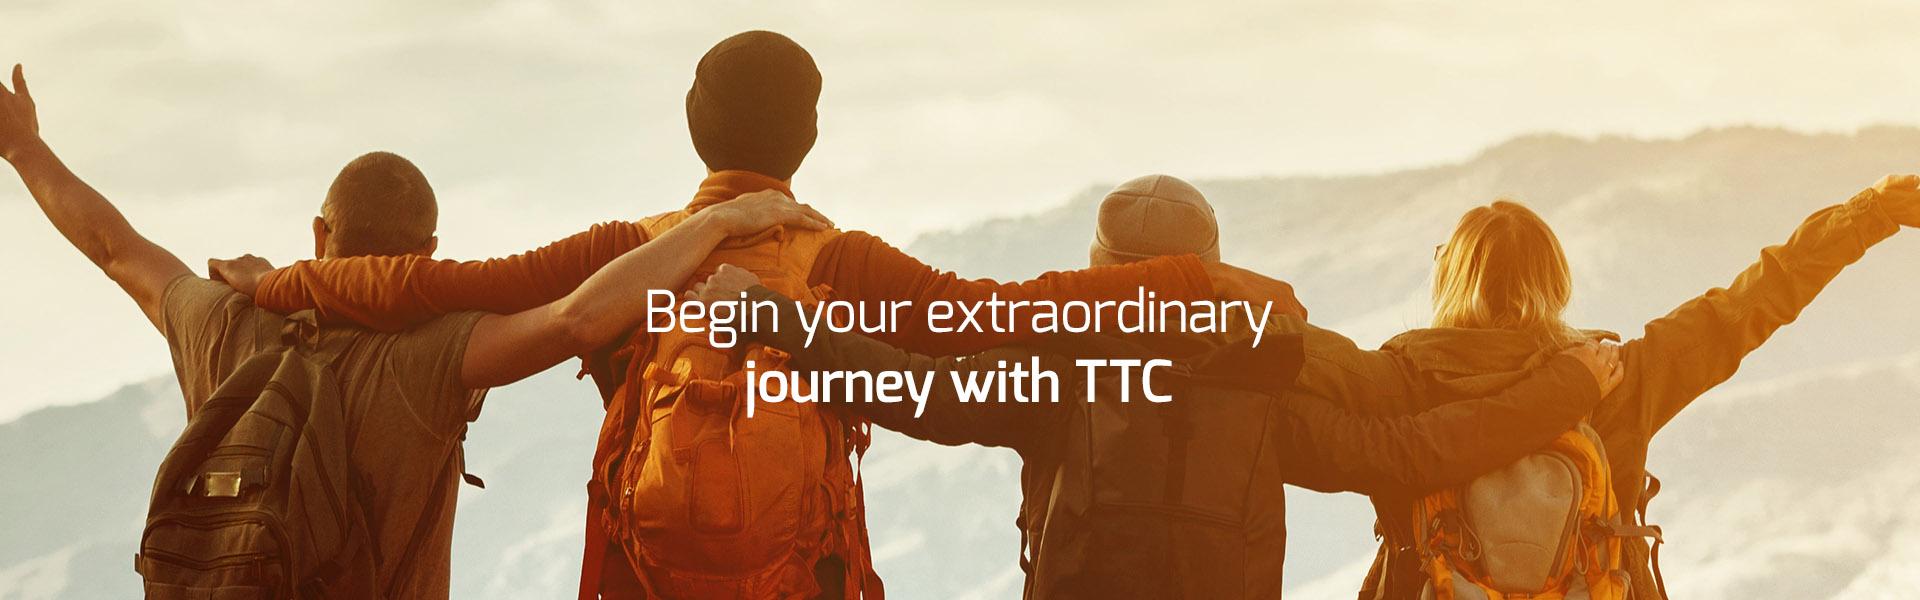 ttc-banner-2-temp